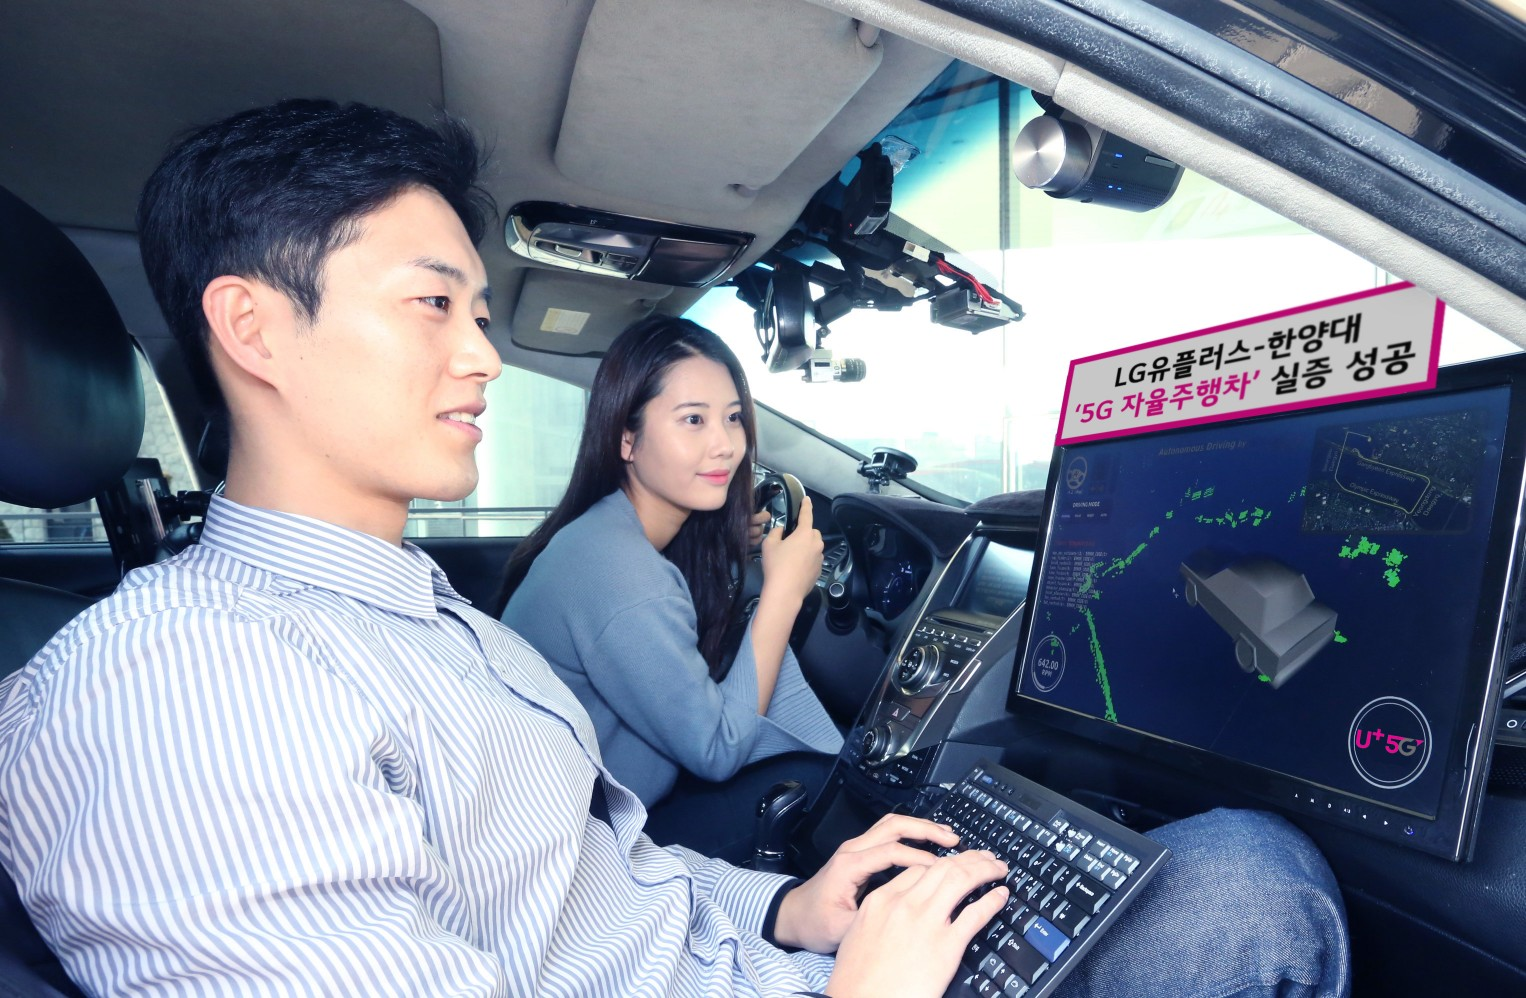 LG유플러스가 한양대와 5G망을 활용한 자율주행차 원격제어를 테스트 하고 있는 모습